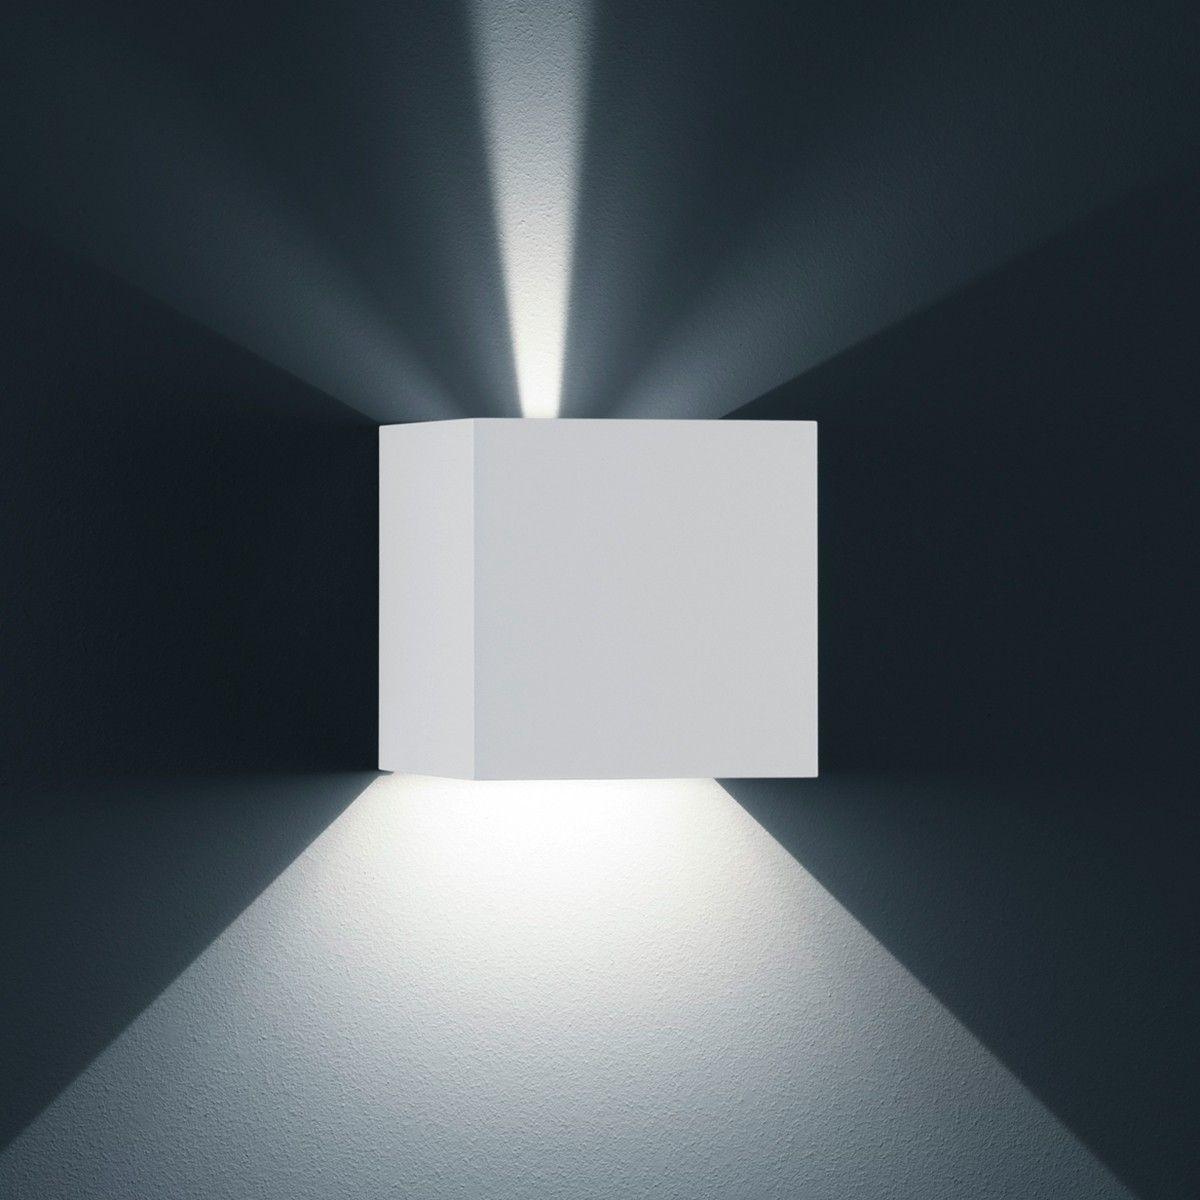 Led Strahler 230v Aussen Aussenlampen Kupfer Haus Aussenlampen Led Aussenleuchte Mit Bewegungsmelder Batteriebetrieben Led Wandleuchte Led Wandleuchten Led